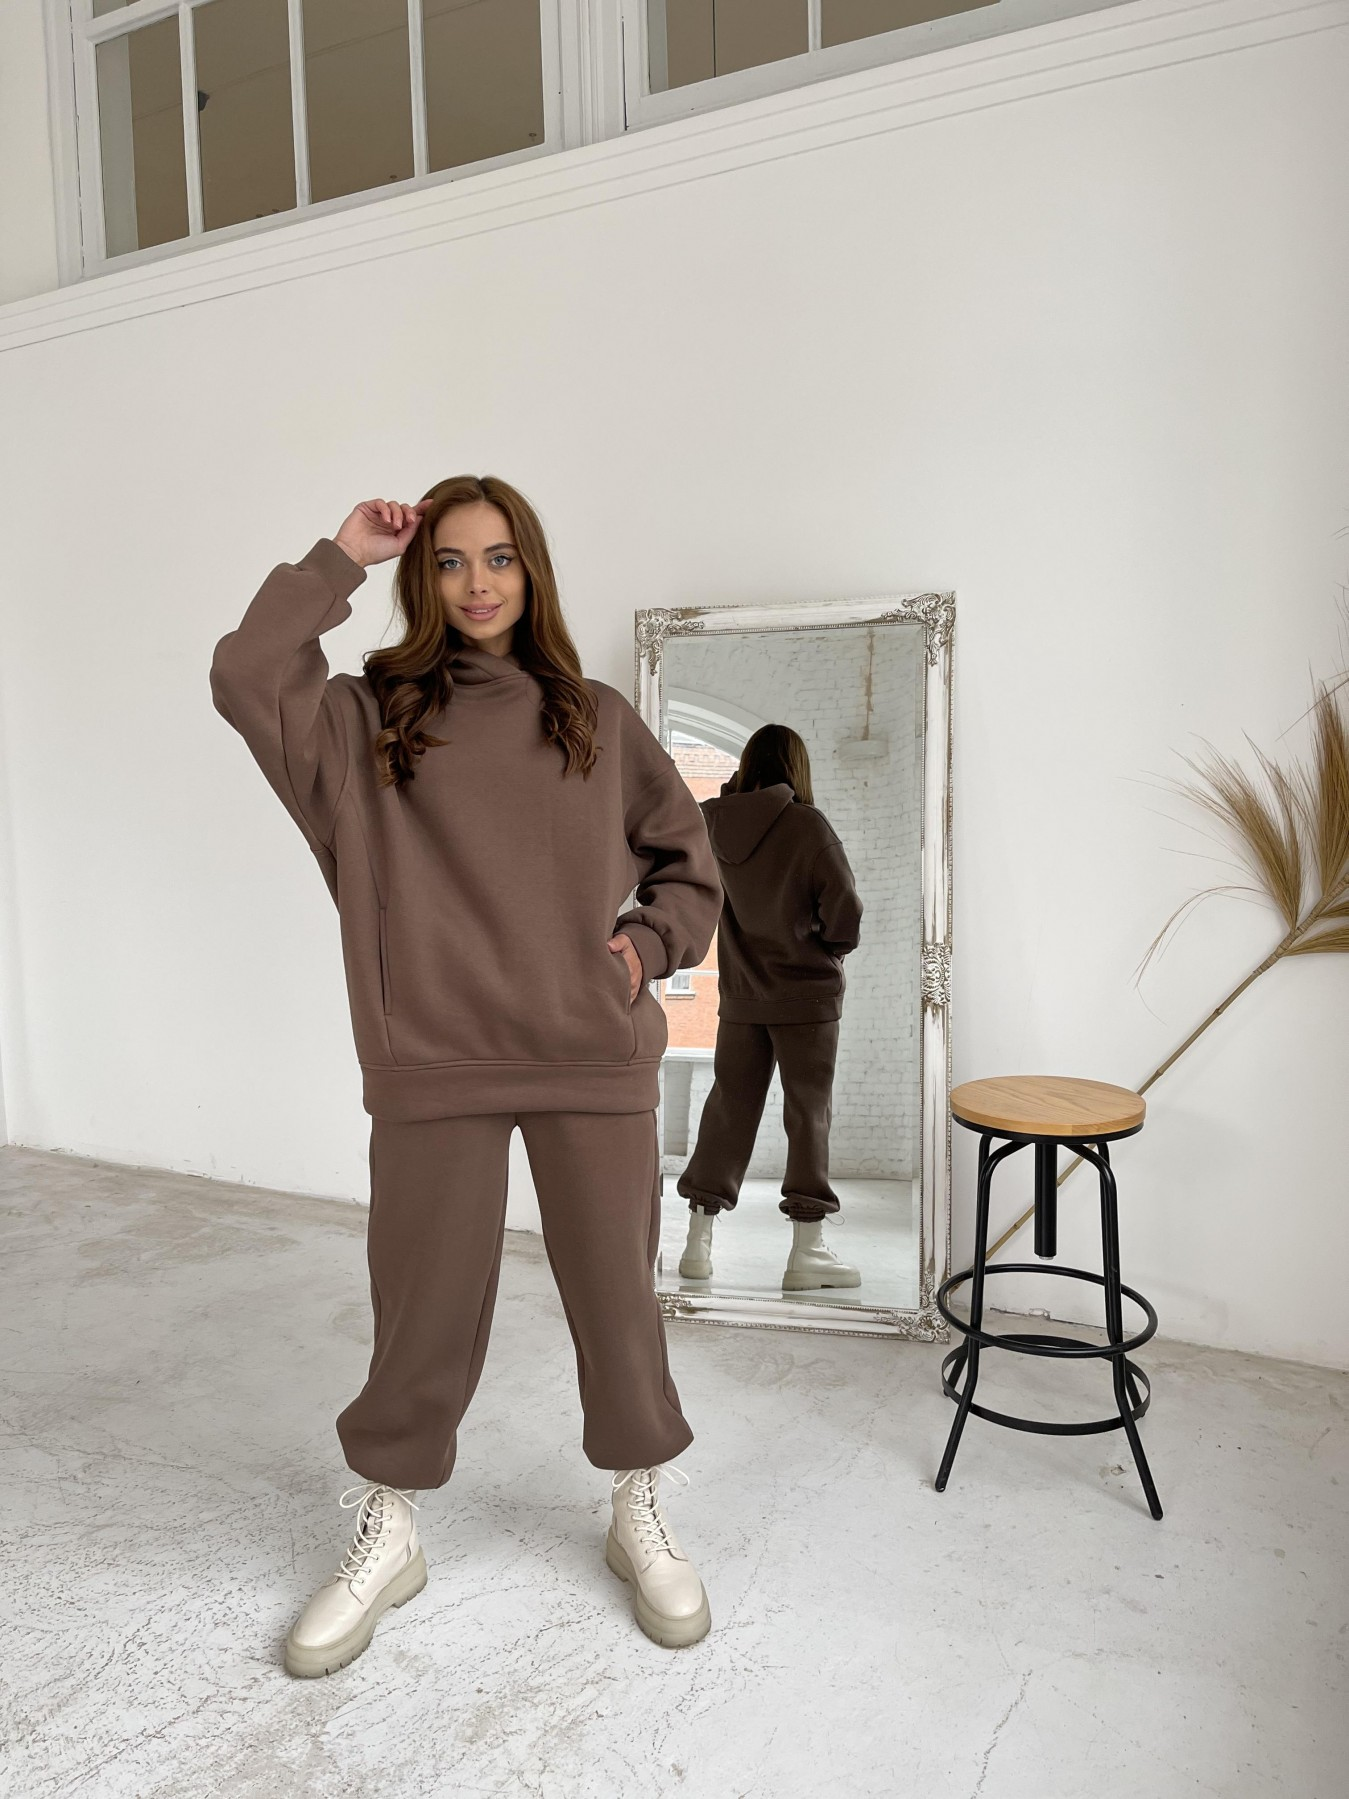 Марион утепленный костюм из трехнити 11852 АРТ. 48656 Цвет: Шоколад - фото 3, интернет магазин tm-modus.ru